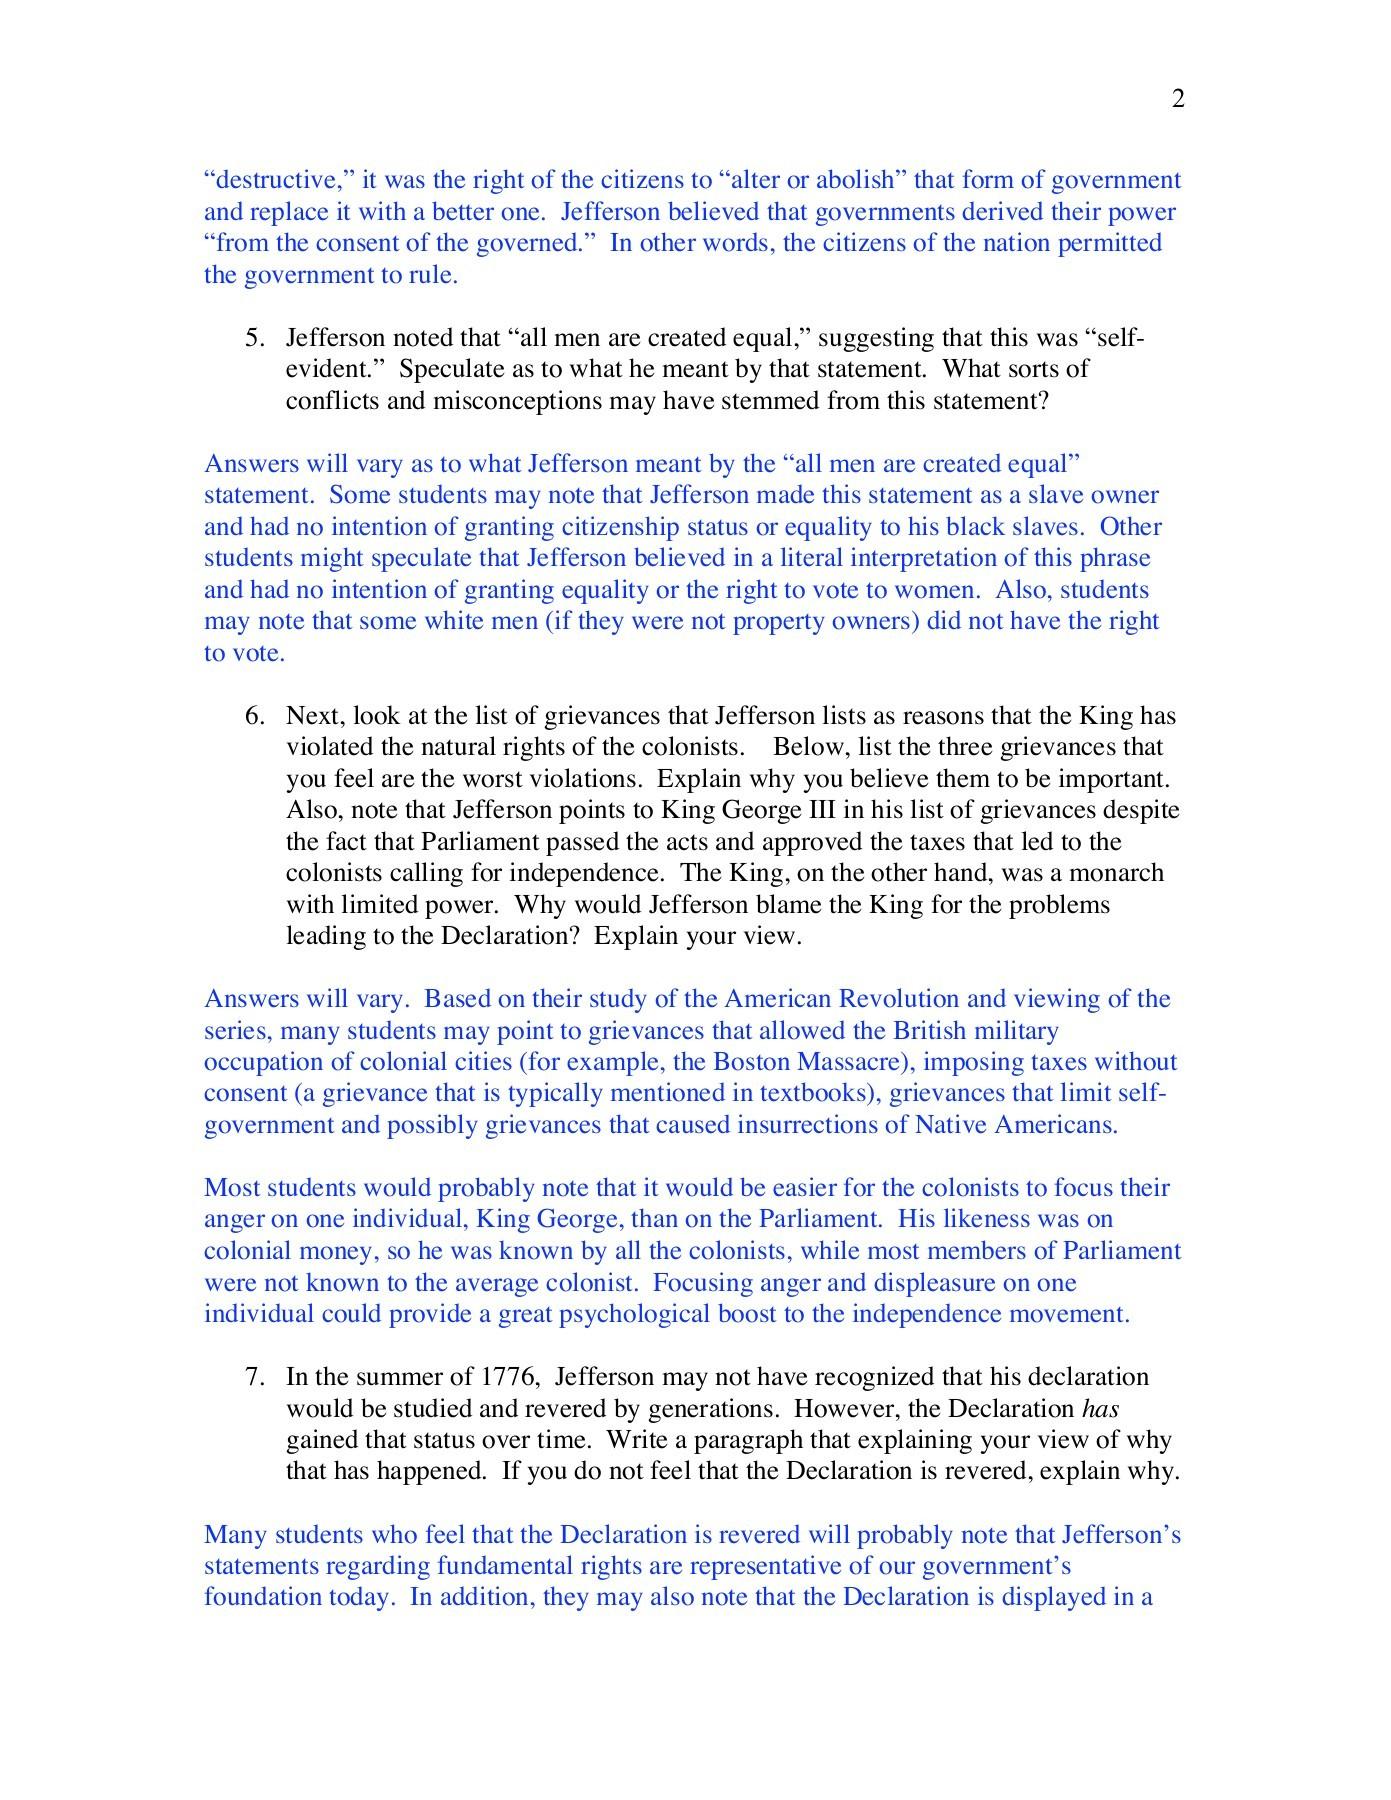 Declaration Of Independence Grievances Worksheet Answer Key